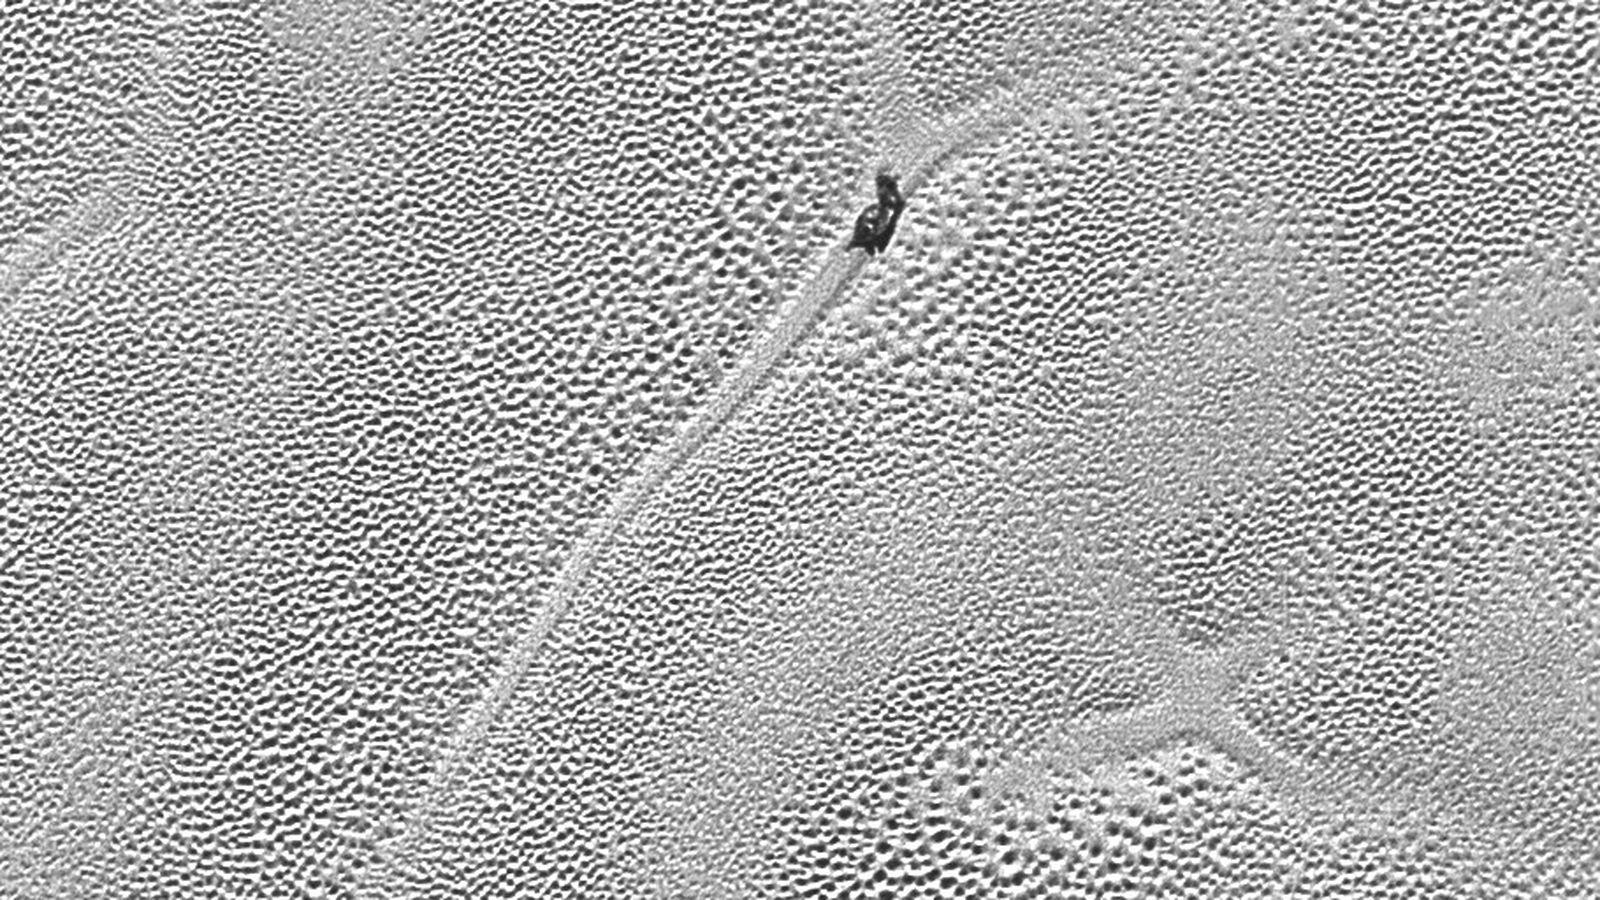 new high resolution nasa images show pluto u0026 39 s  u0026 39 lava lamp